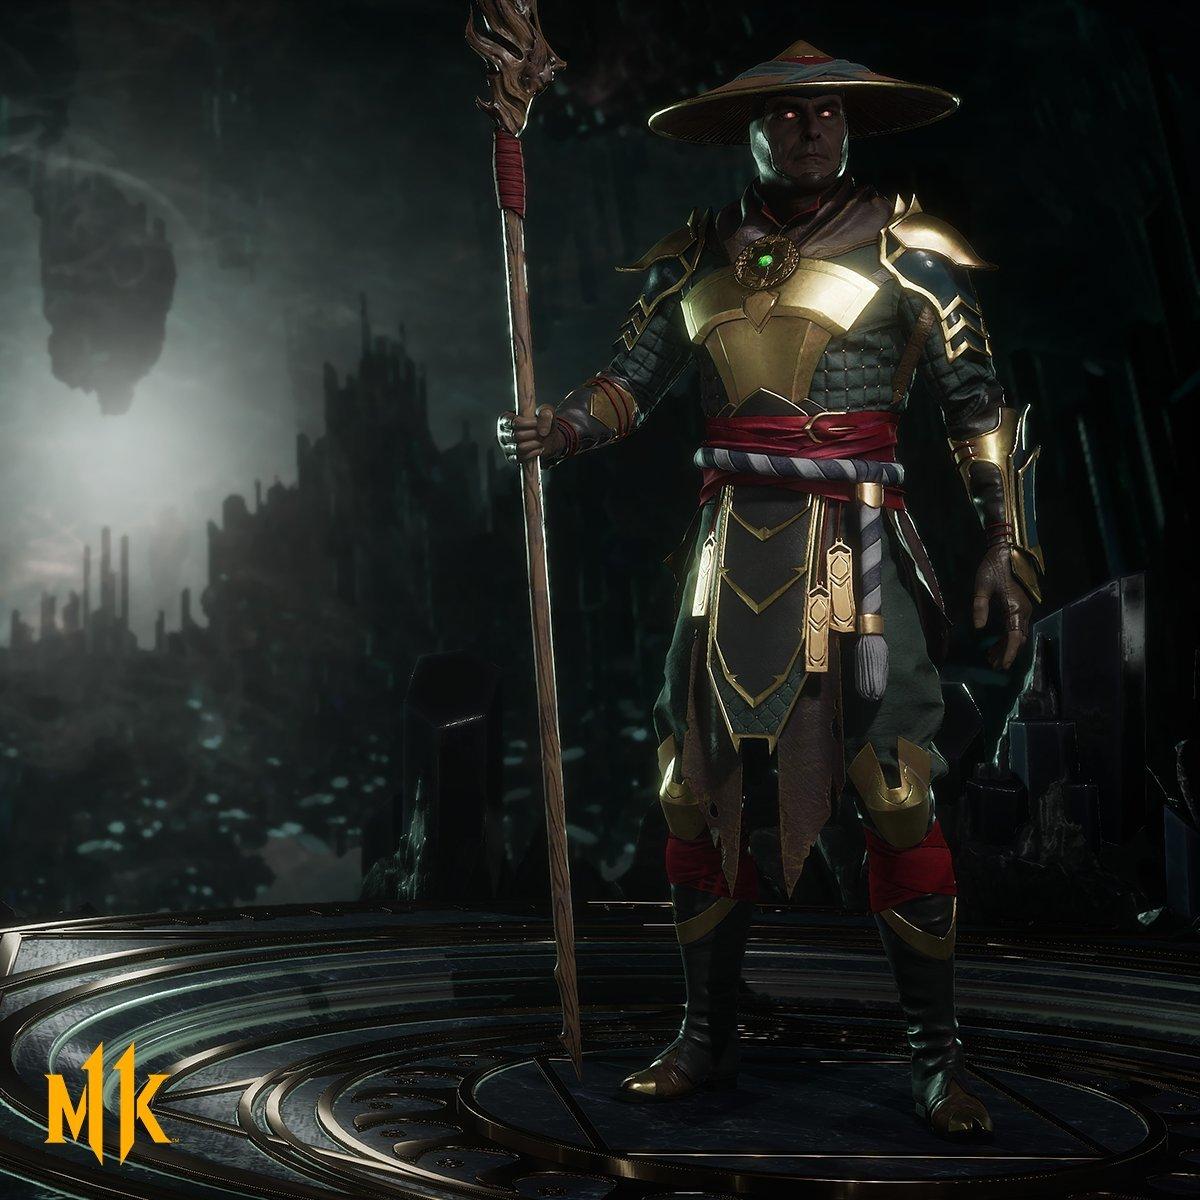 New Render Shows Raiden Character Model In Mortal Kombat 11